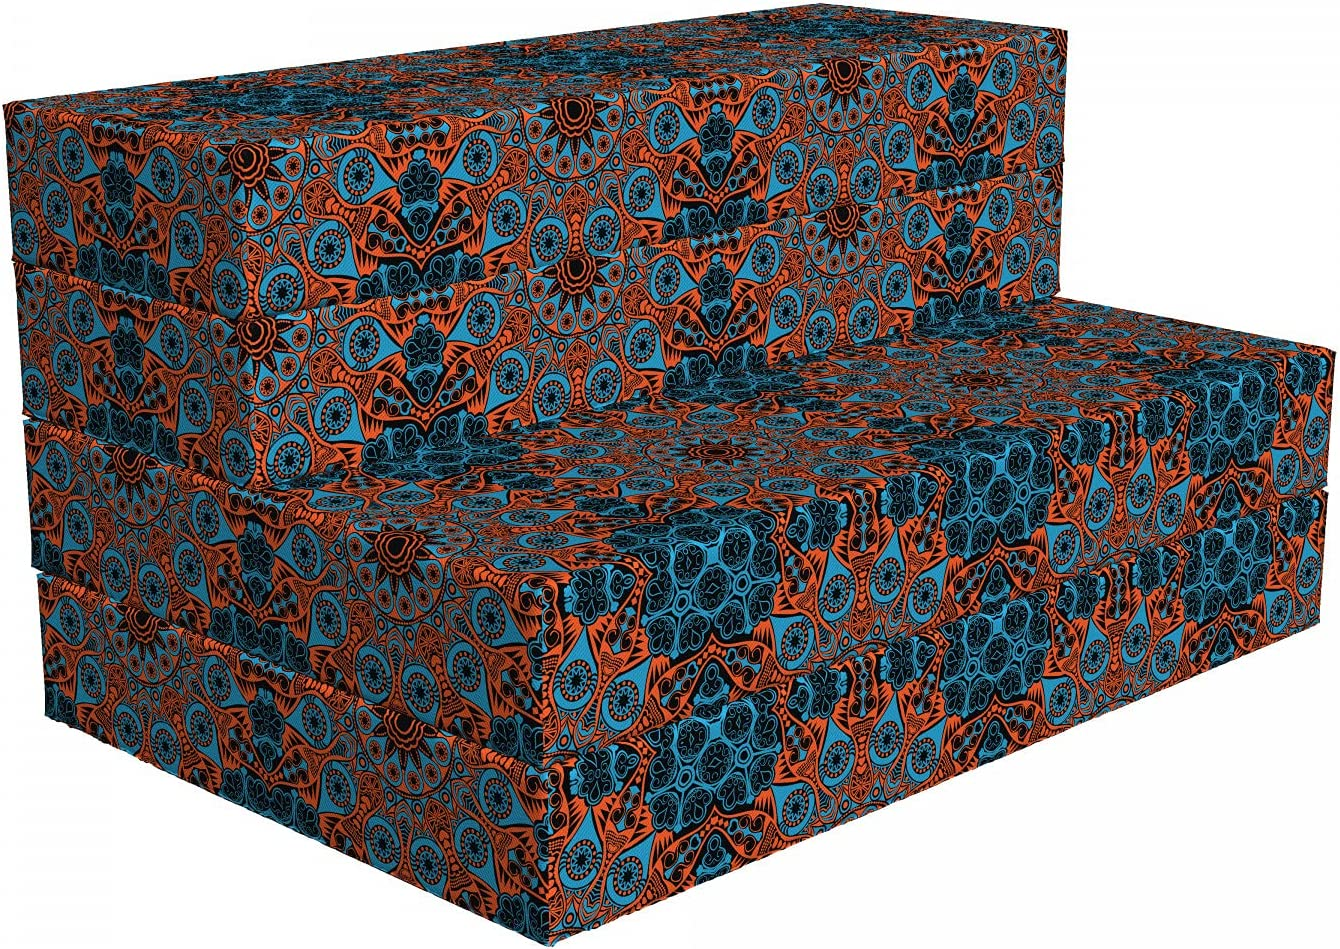 Ambesonne Max 58% OFF Quality inspection Mandala Foldable Mattress Chinese Lace x Motif 74.8